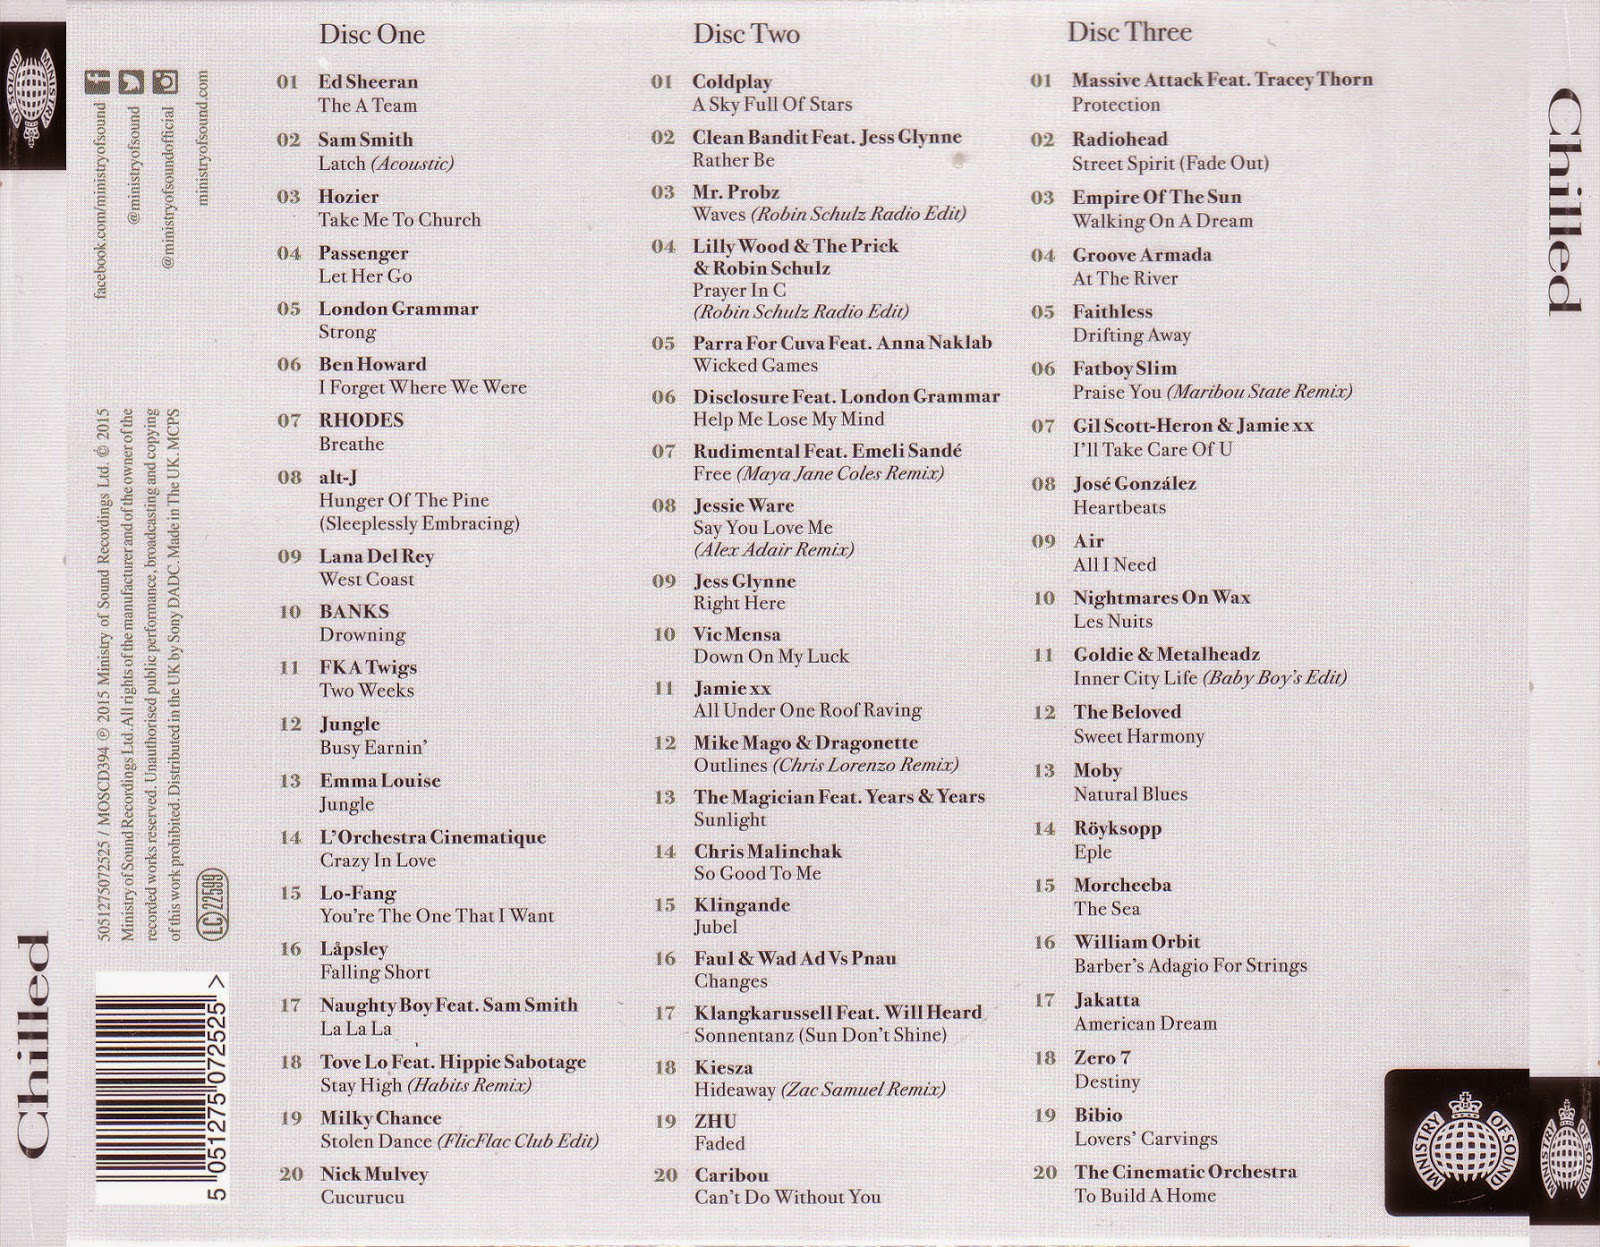 VA. - Ministry Of Sound - CHILLED (2015) 3CDs [MEGA